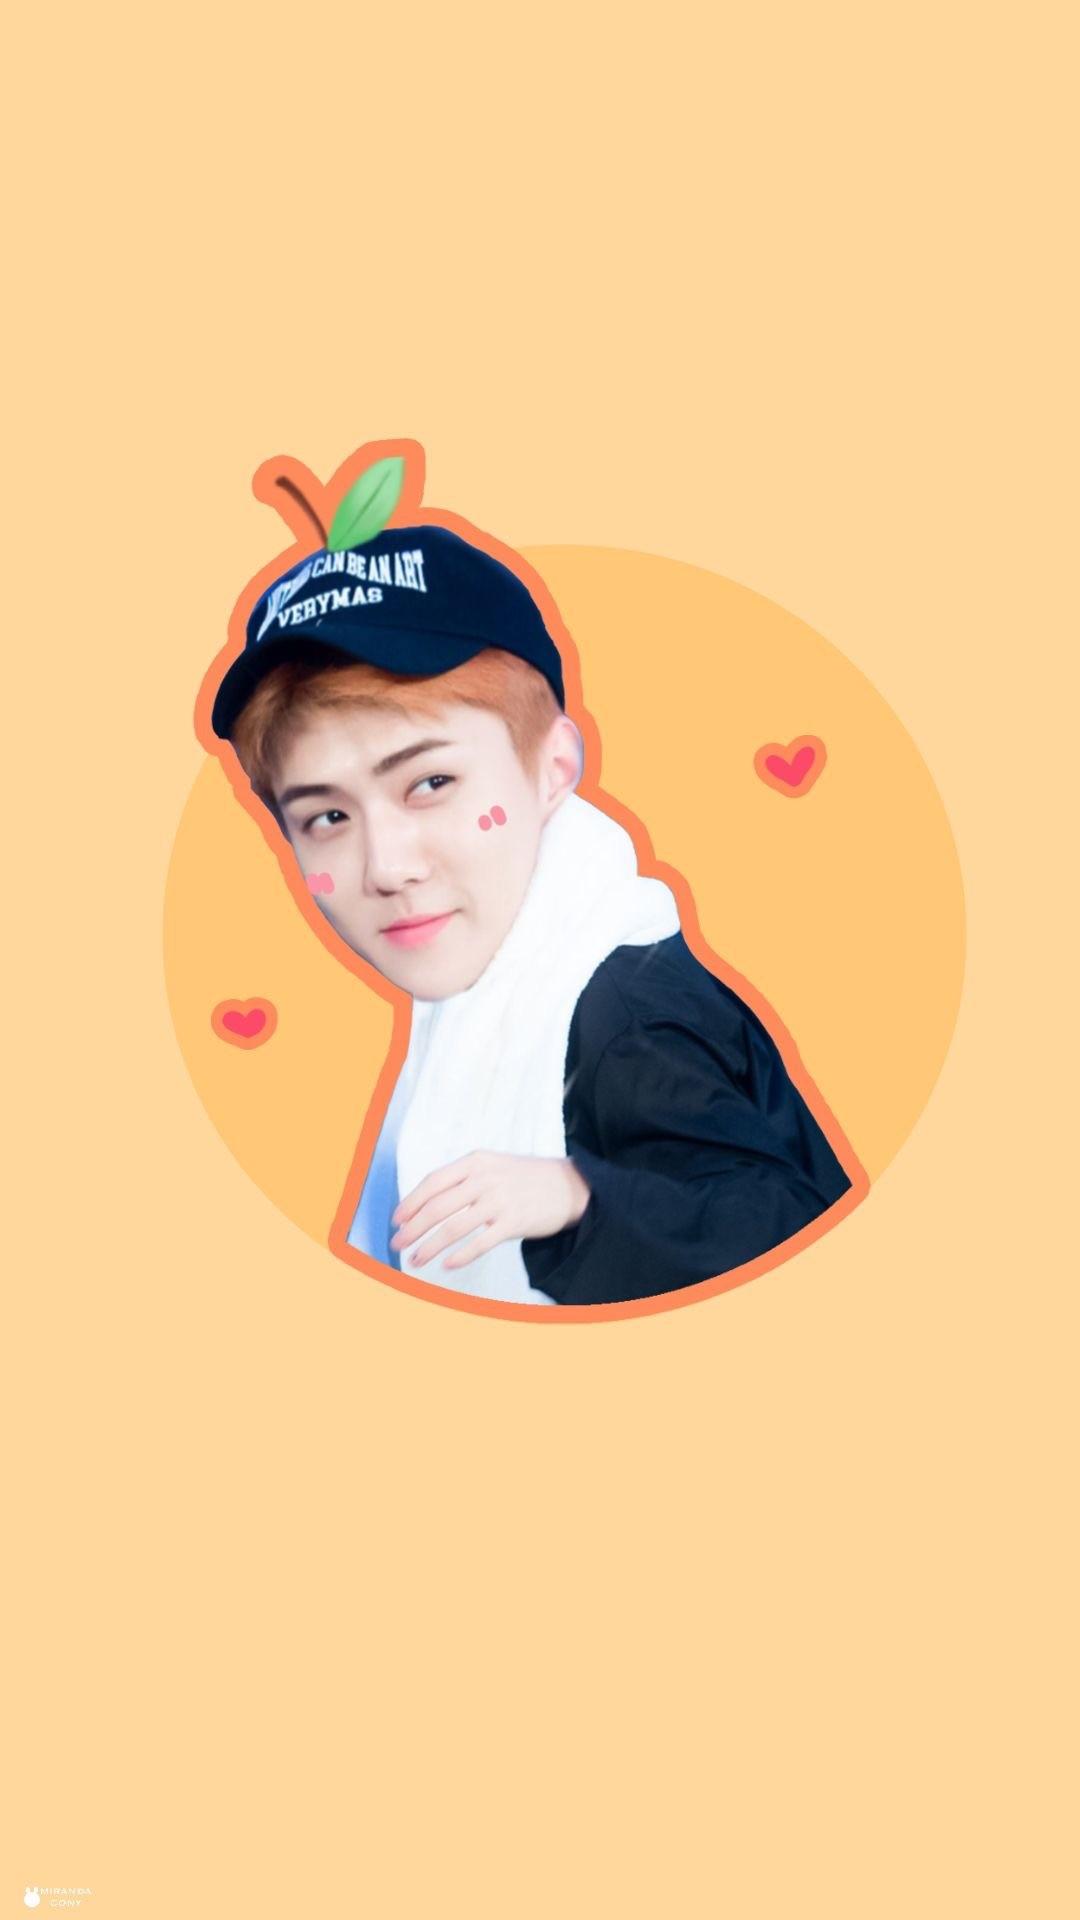 Sehun Exo Kpop Locks Oh Sehun Sehun Locks Exo Locks - Lockscreen Aesthetic Exo , HD Wallpaper & Backgrounds